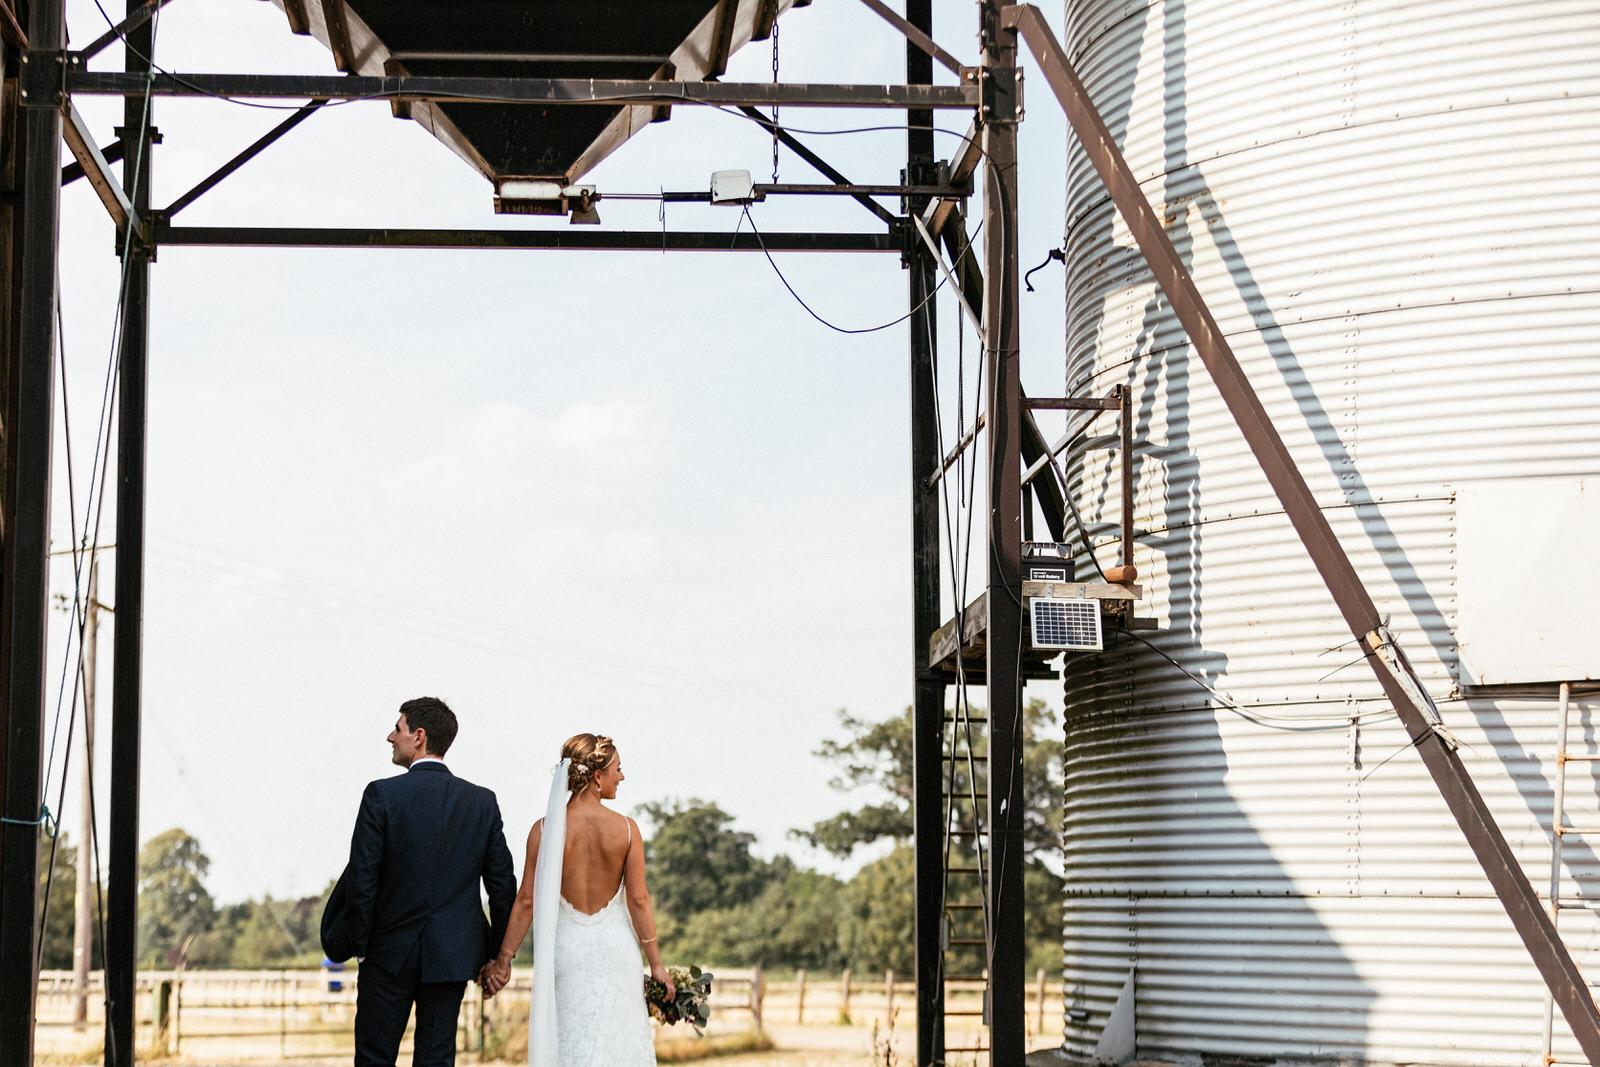 Edworth-Manor-Farm-Wedding-Photographer-052.jpg